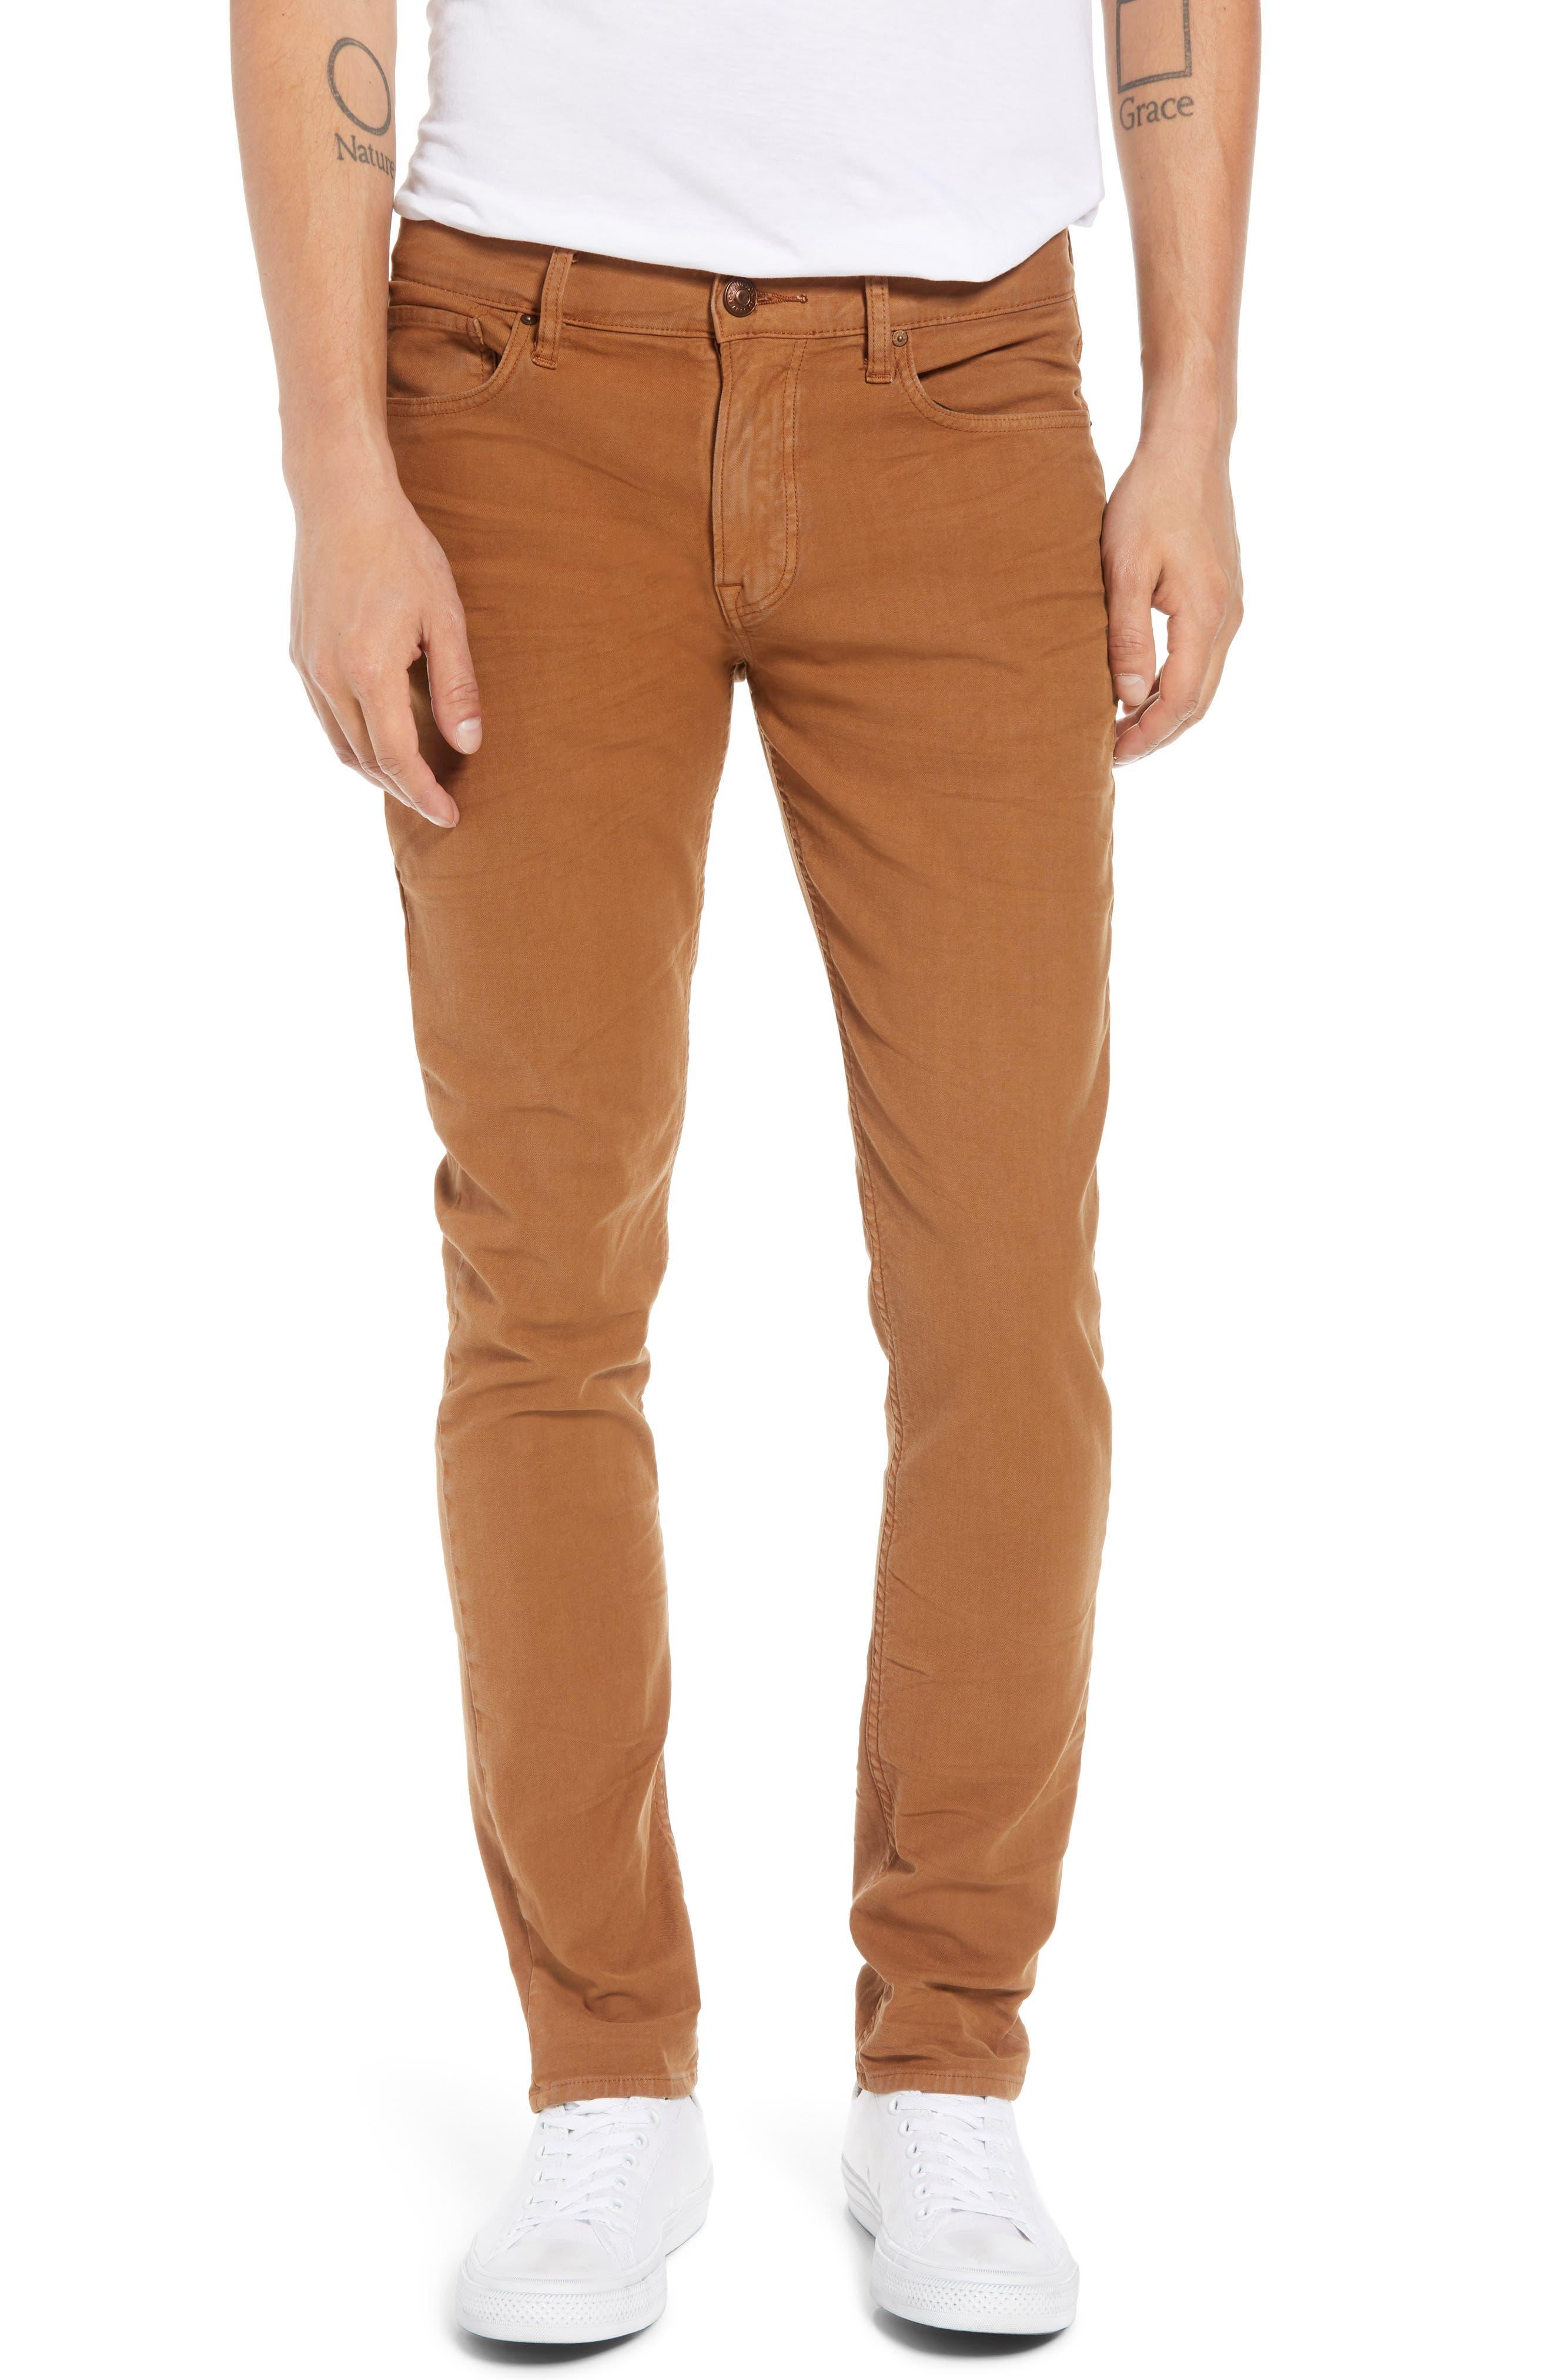 Men's Hudson Jeans Axl Skinny Fit Jeans, Size 36 - Brown